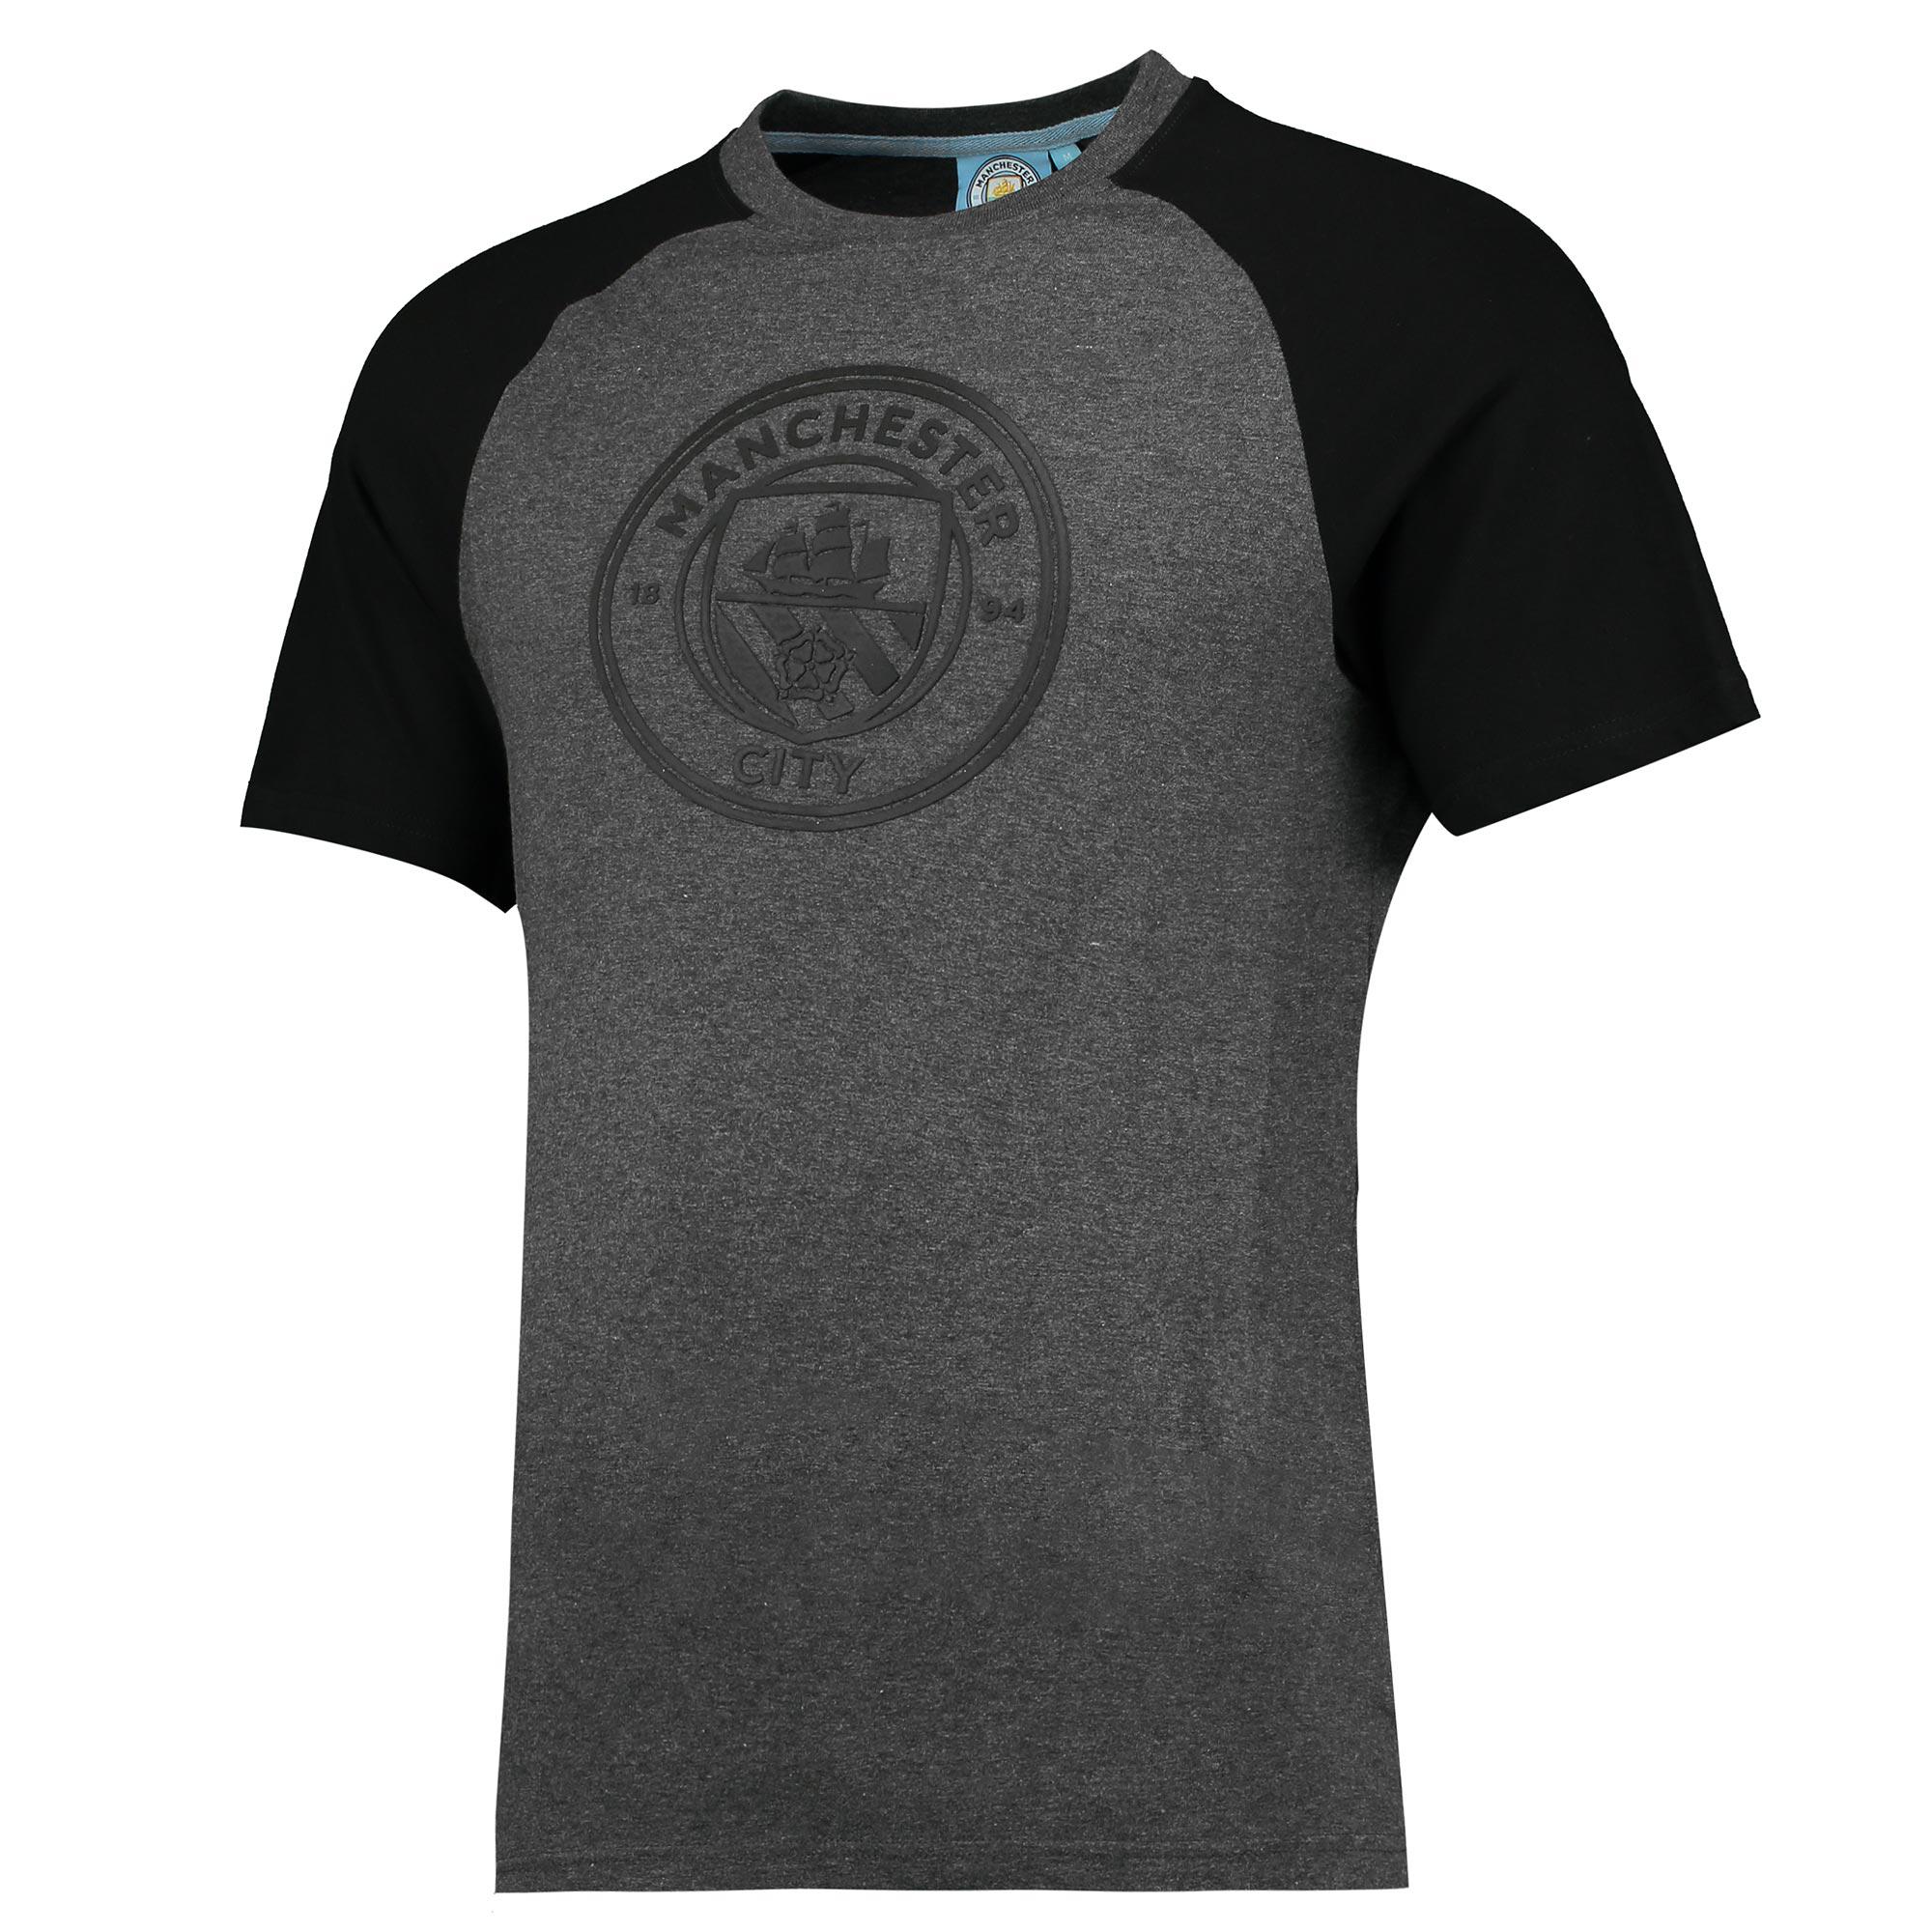 Manchester City Classic Raglan T-Shirt - Grey/Black